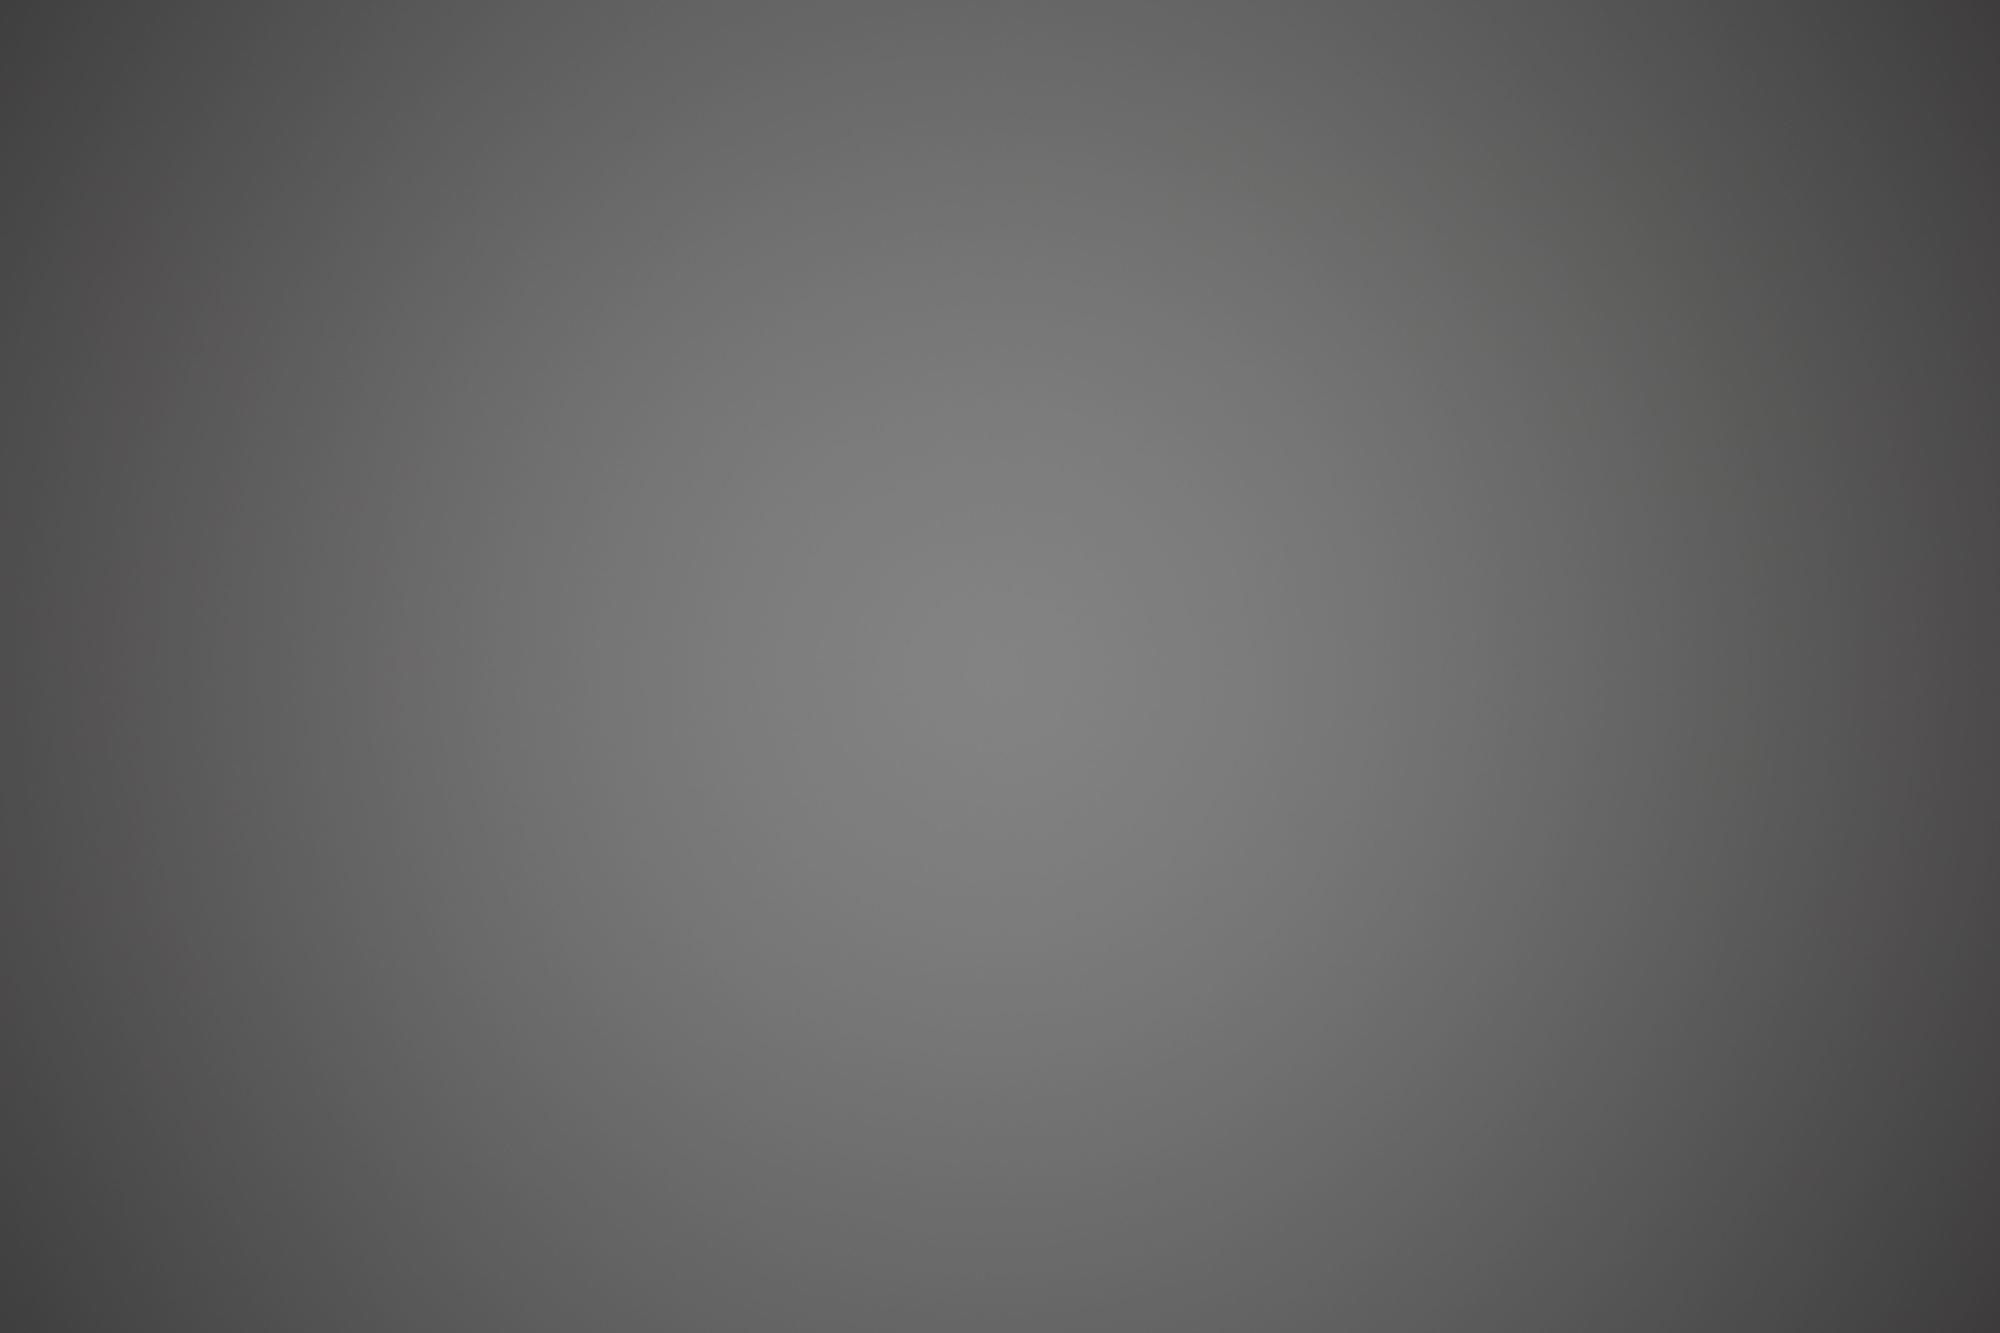 f:id:snct-astro:20210117014900j:plain